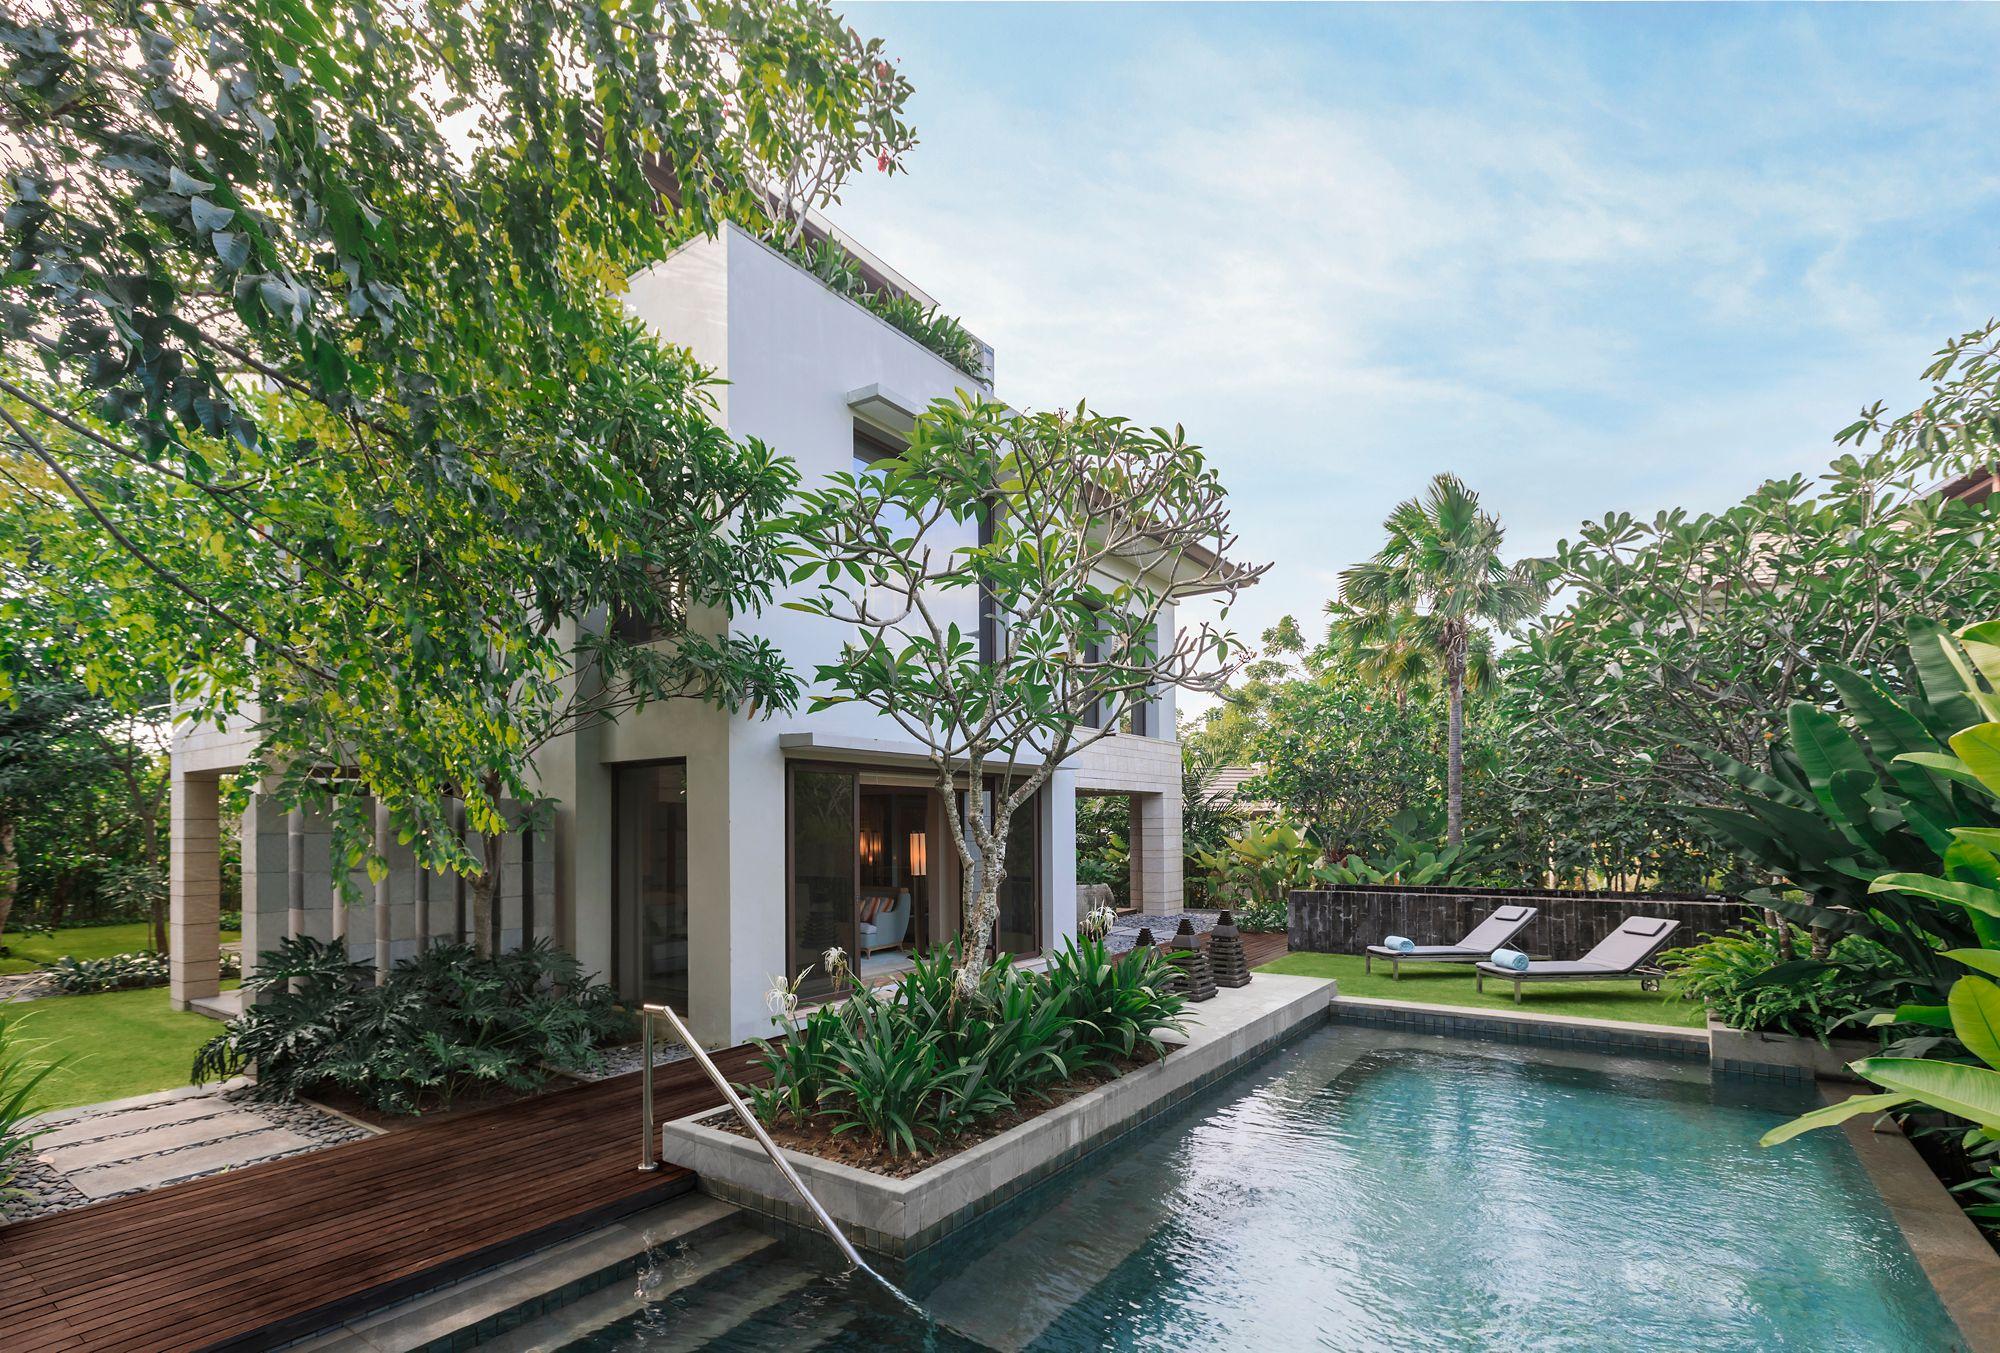 Luxury Honeymoon Villa In Bali With Private Pool The Ritz Carlton Bali